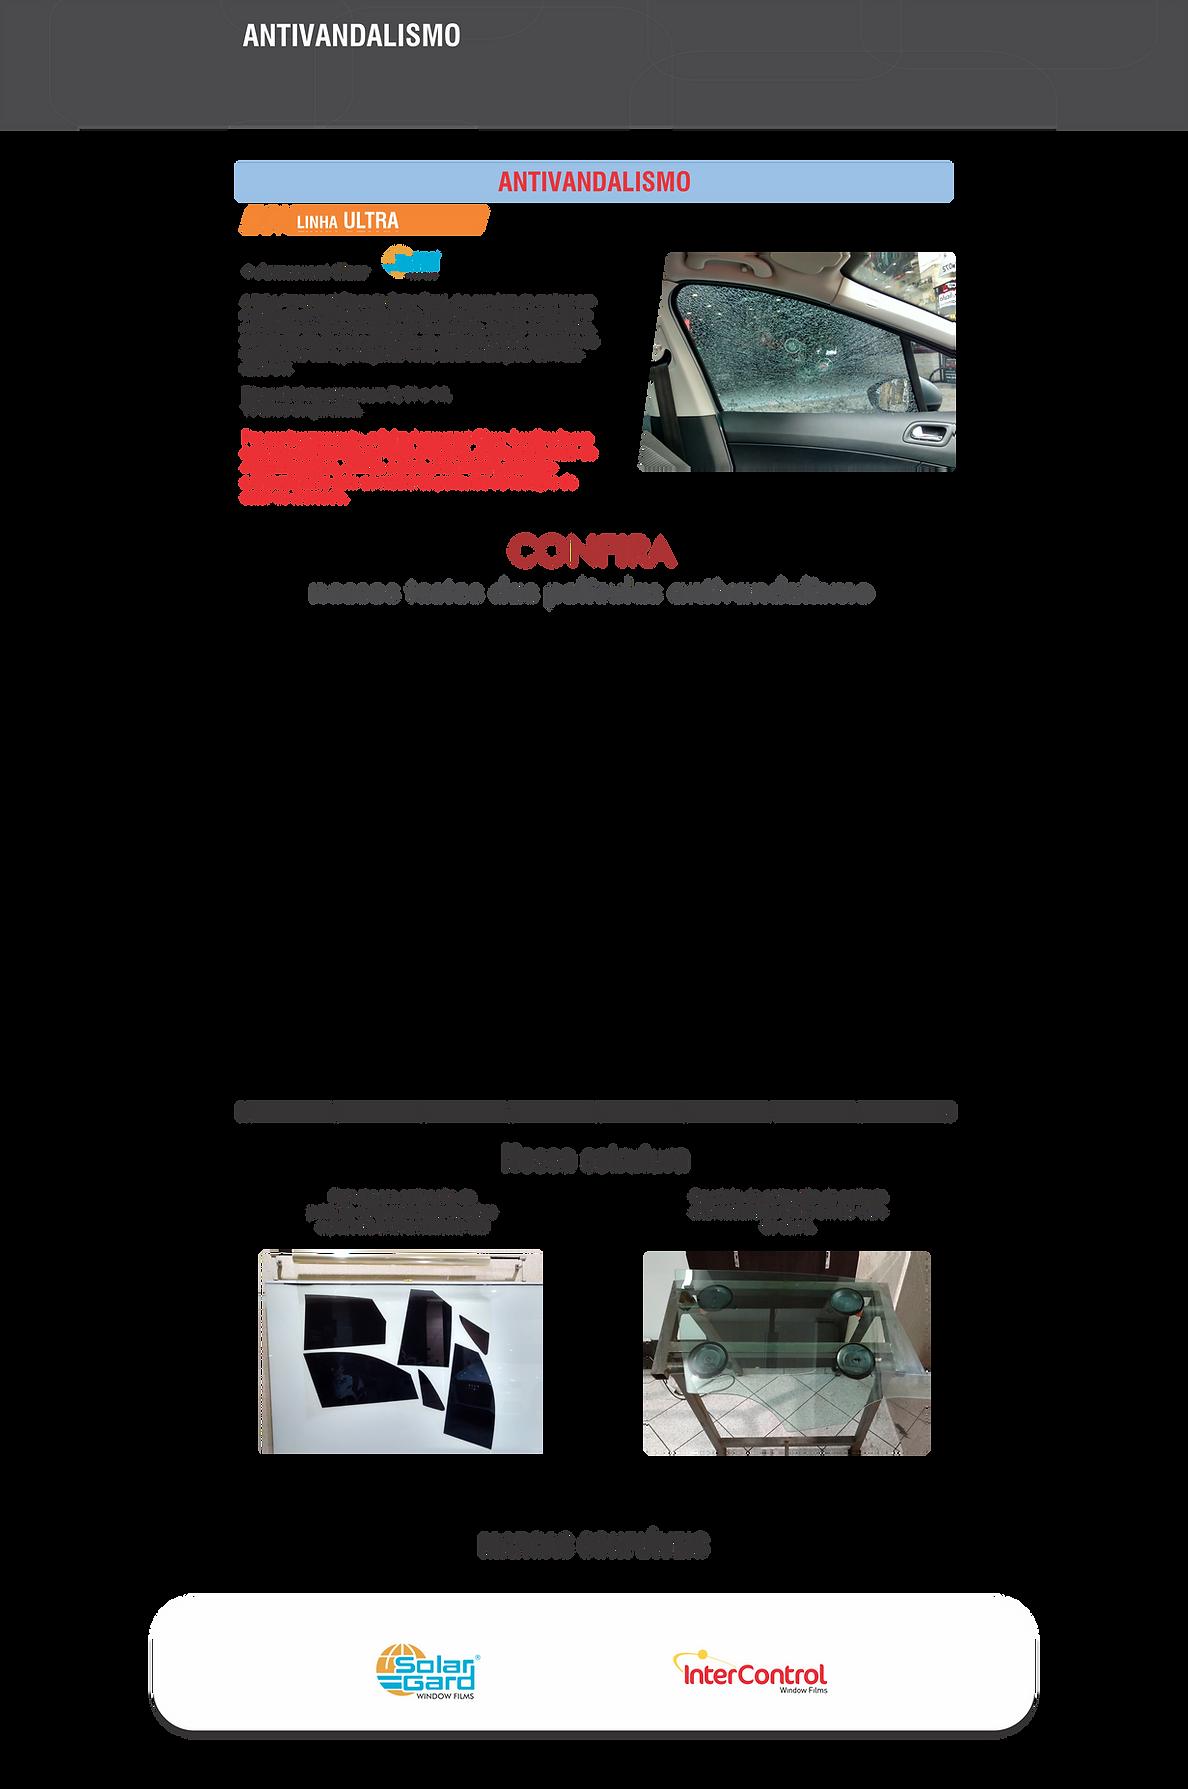 Pagina antivandalismo - site wix 2020.pn